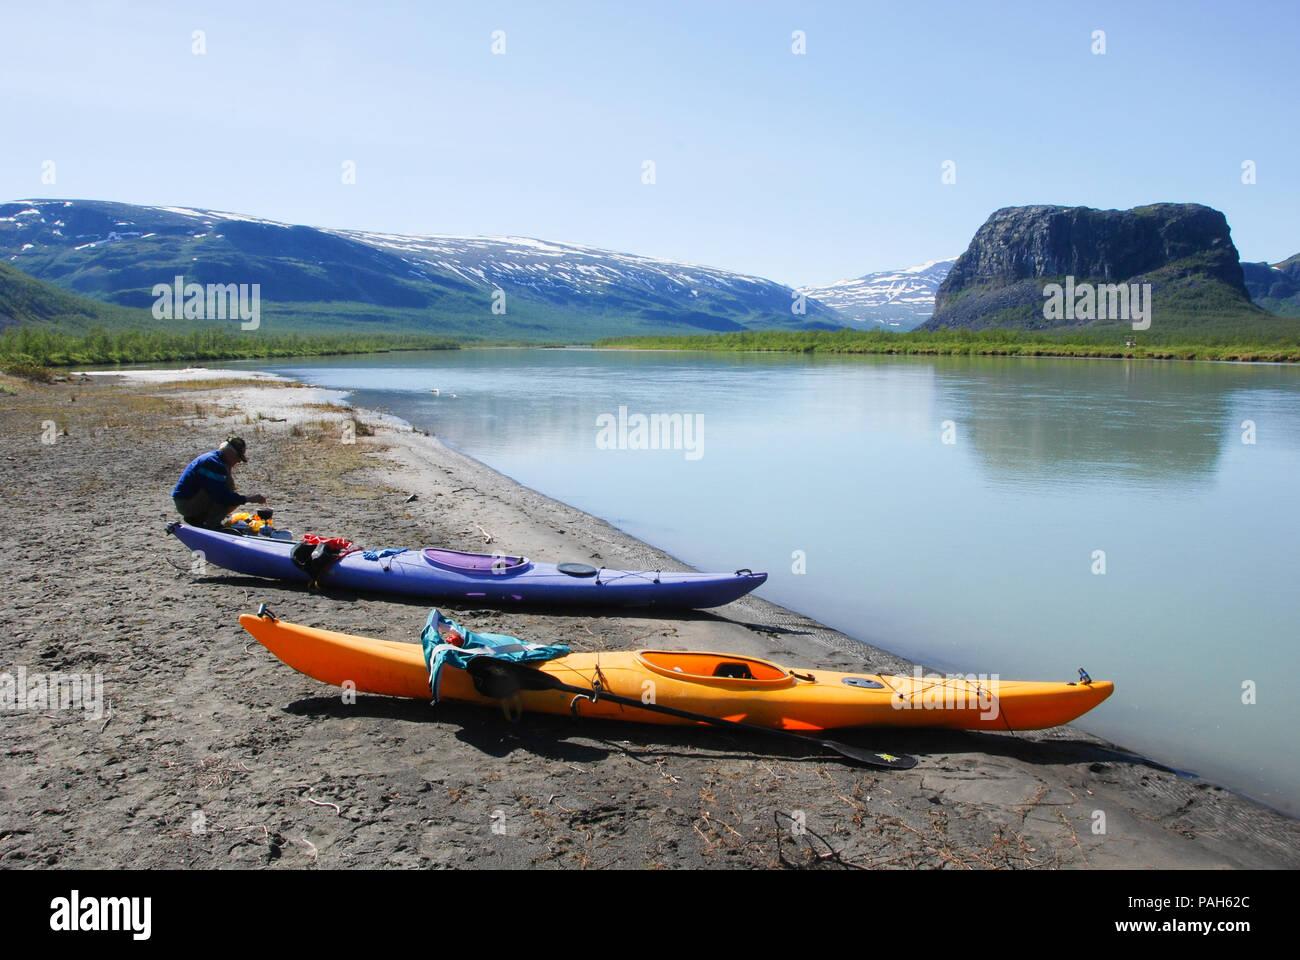 Skierfe - Paddling to the gate of Sarek. Rapaätno delta, Jokkmokk, Sweden. Stock Photo